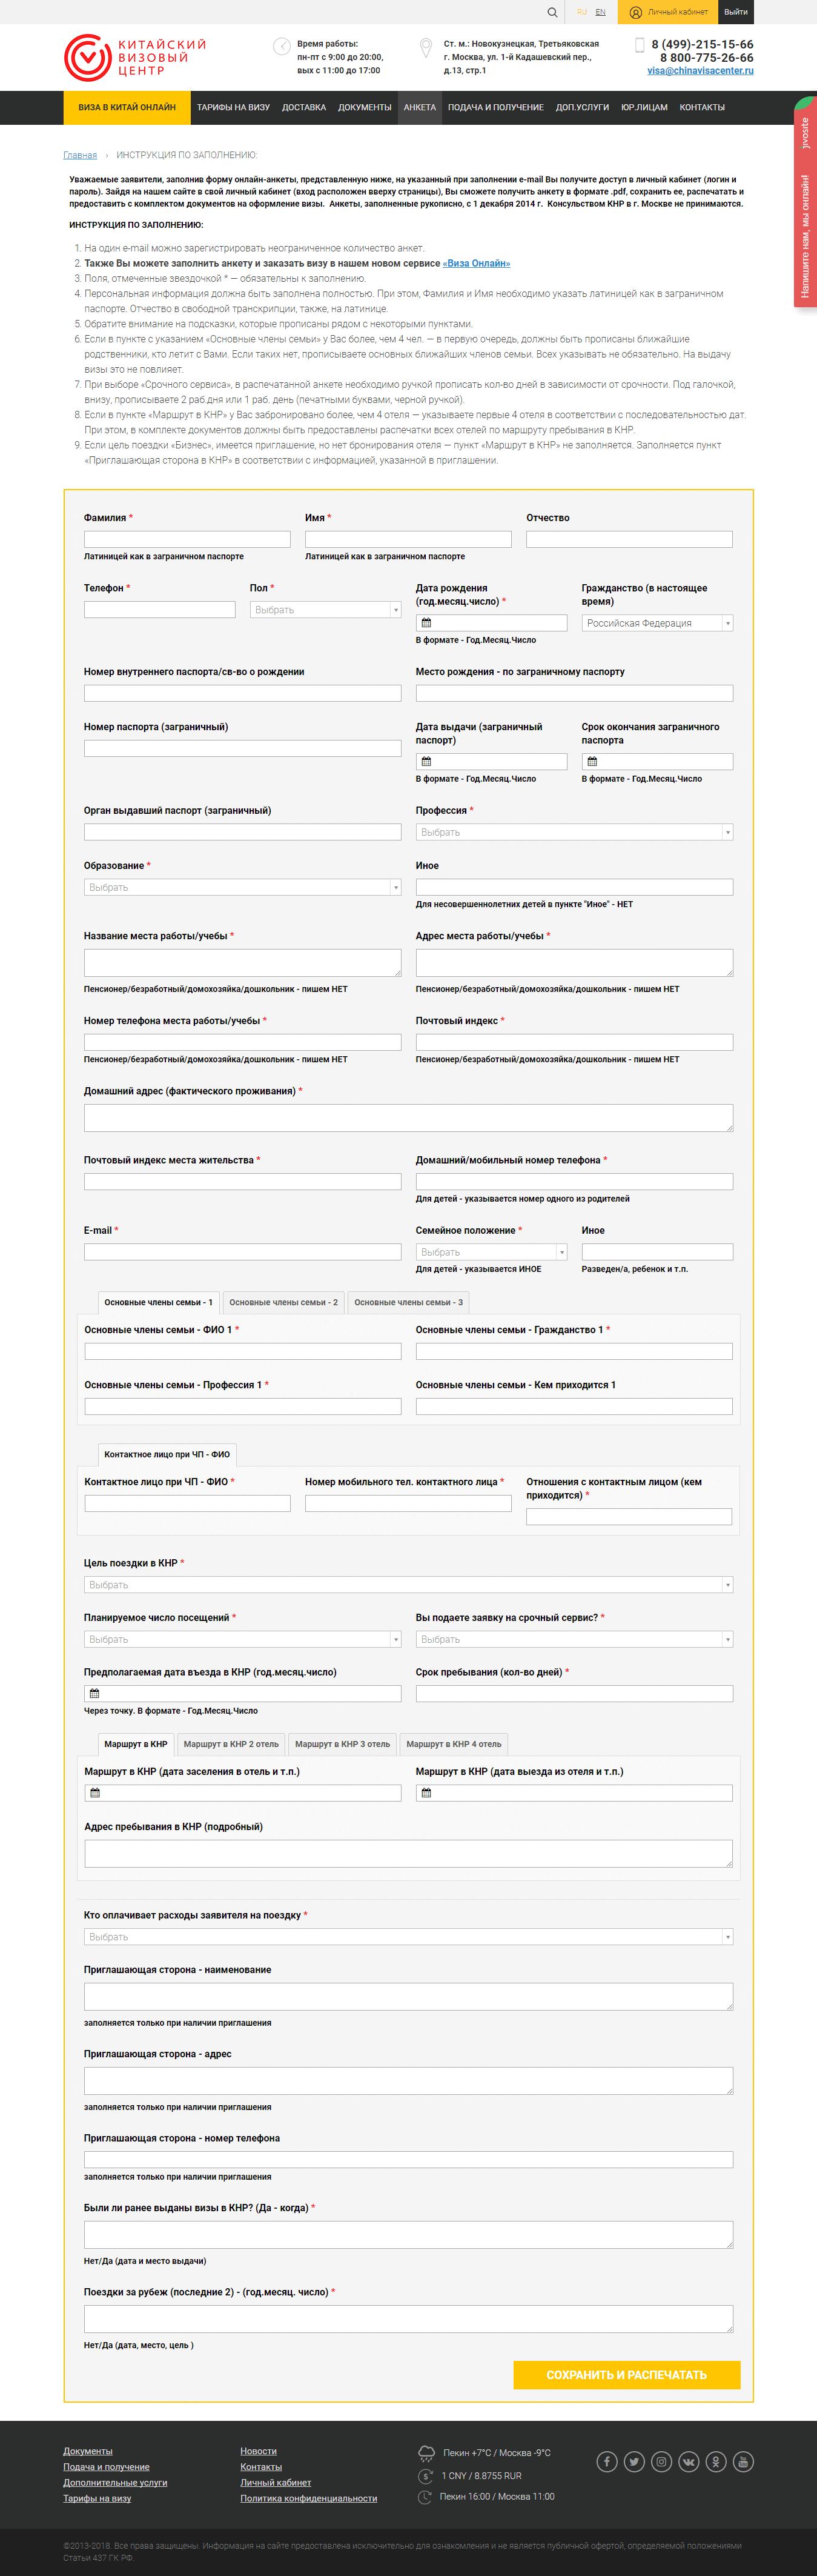 создание веб-сервиса для Китайского Визового Центра